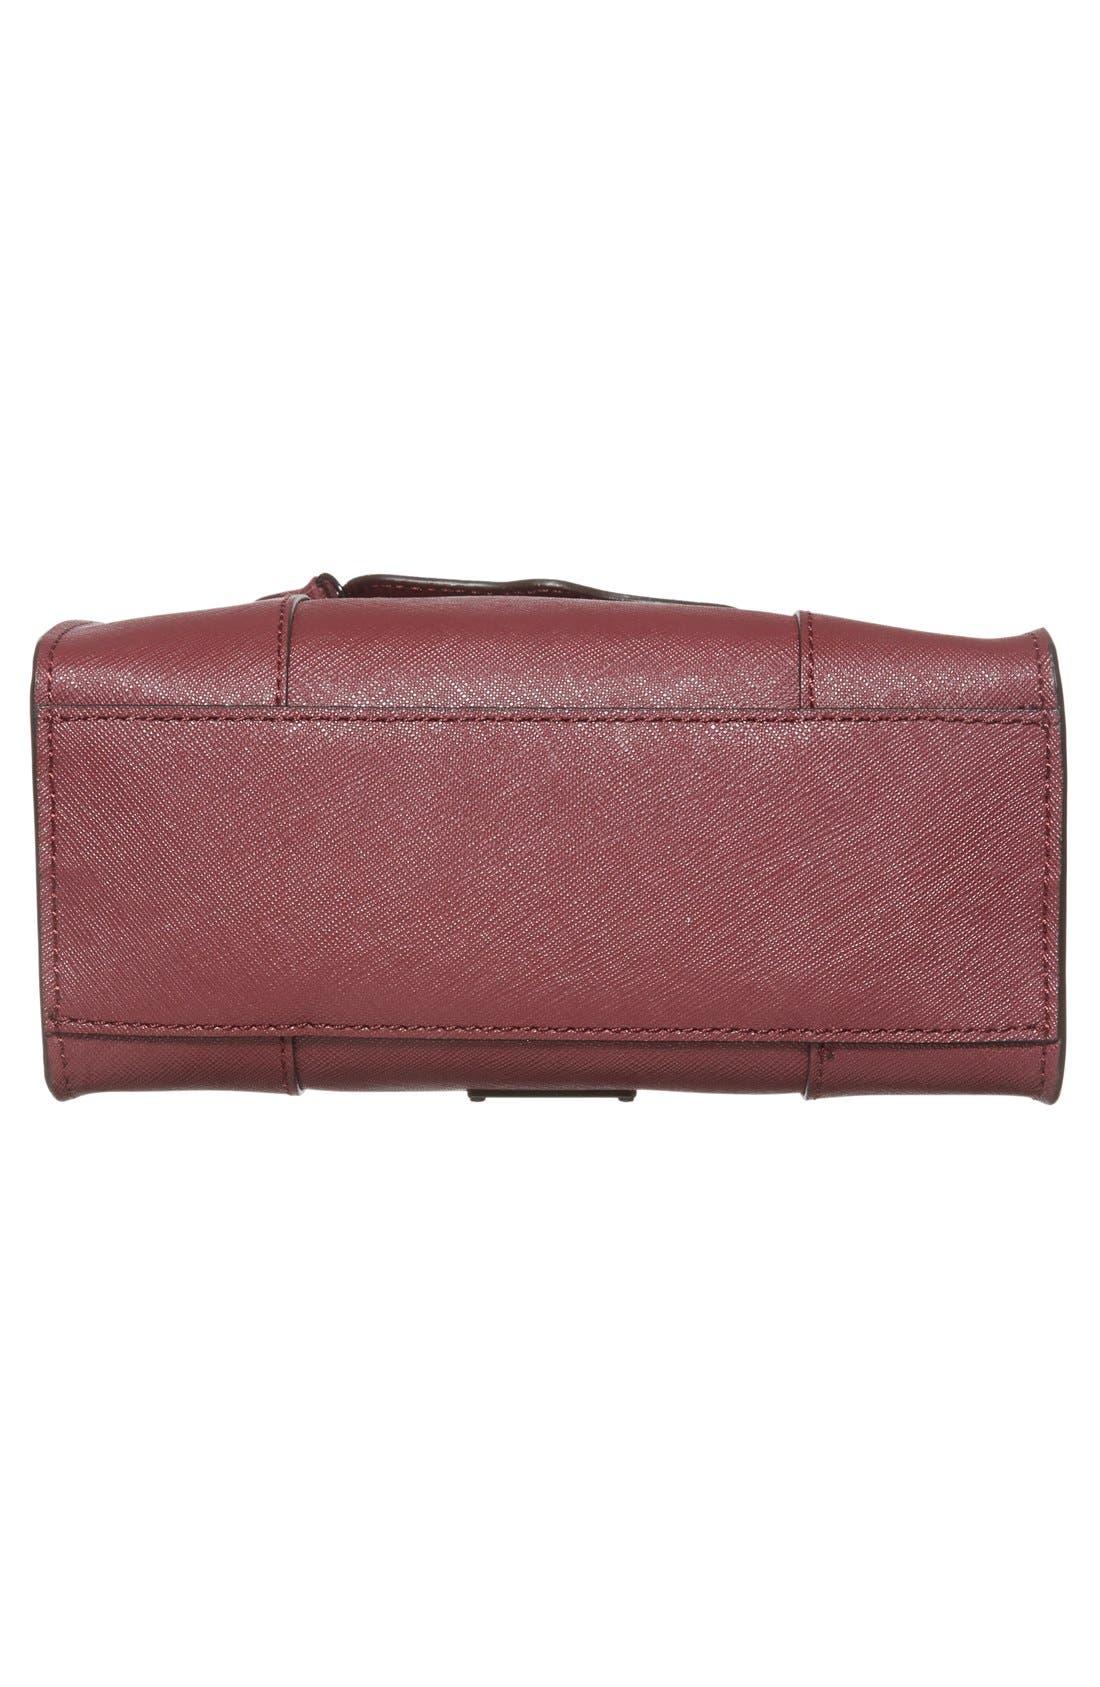 ,                             'Mini MAB Tote' Crossbody Bag,                             Alternate thumbnail 150, color,                             930